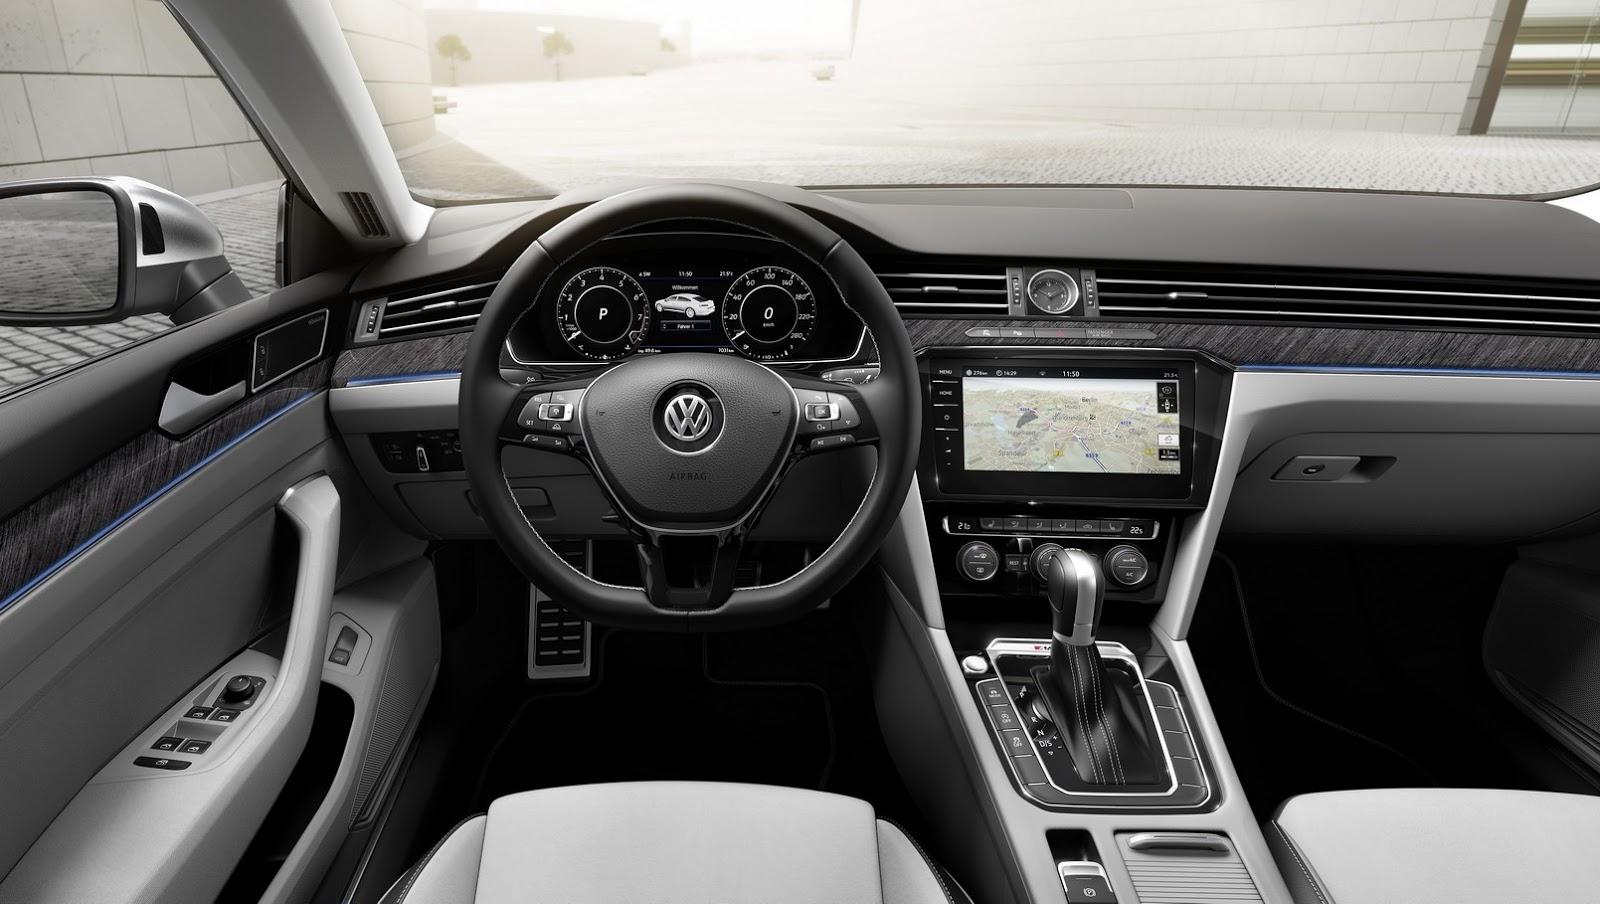 2018 Volkswagen Arteon bows in at Geneva Show - ForceGT.com